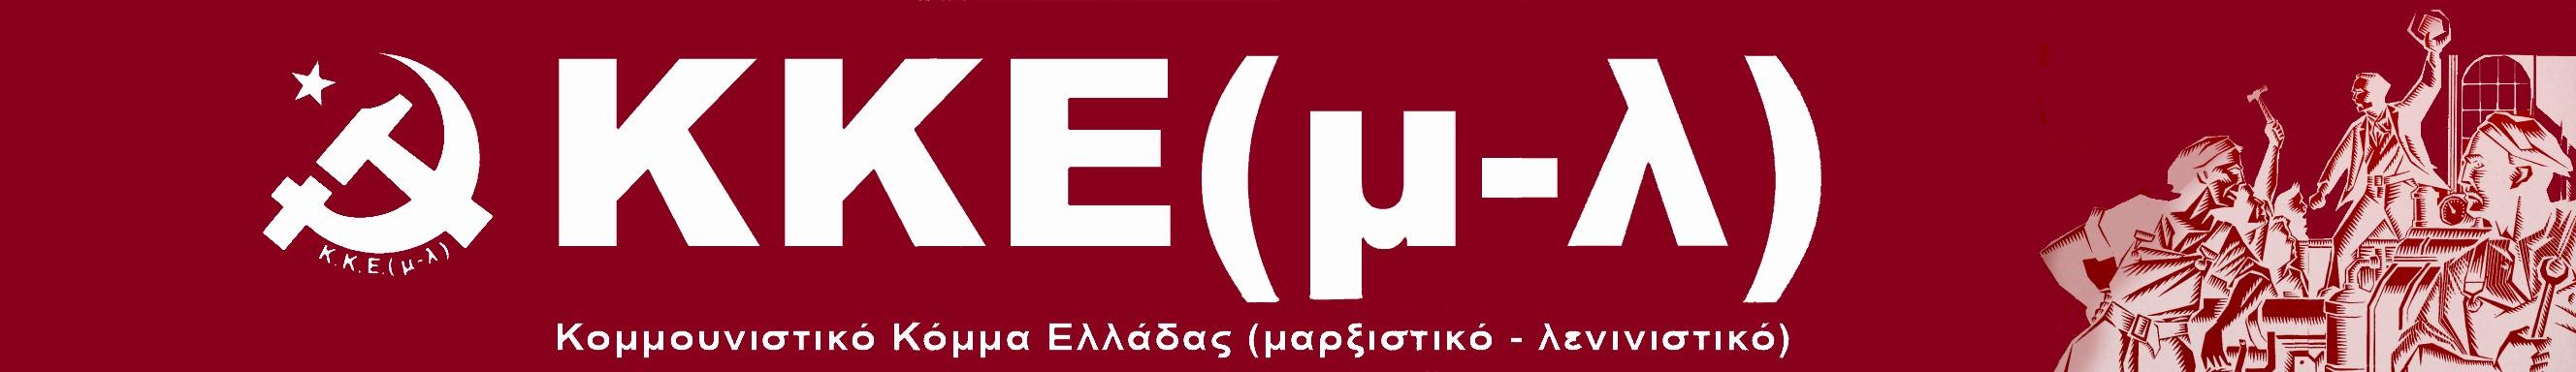 KKE(ml) CPG(m-l)